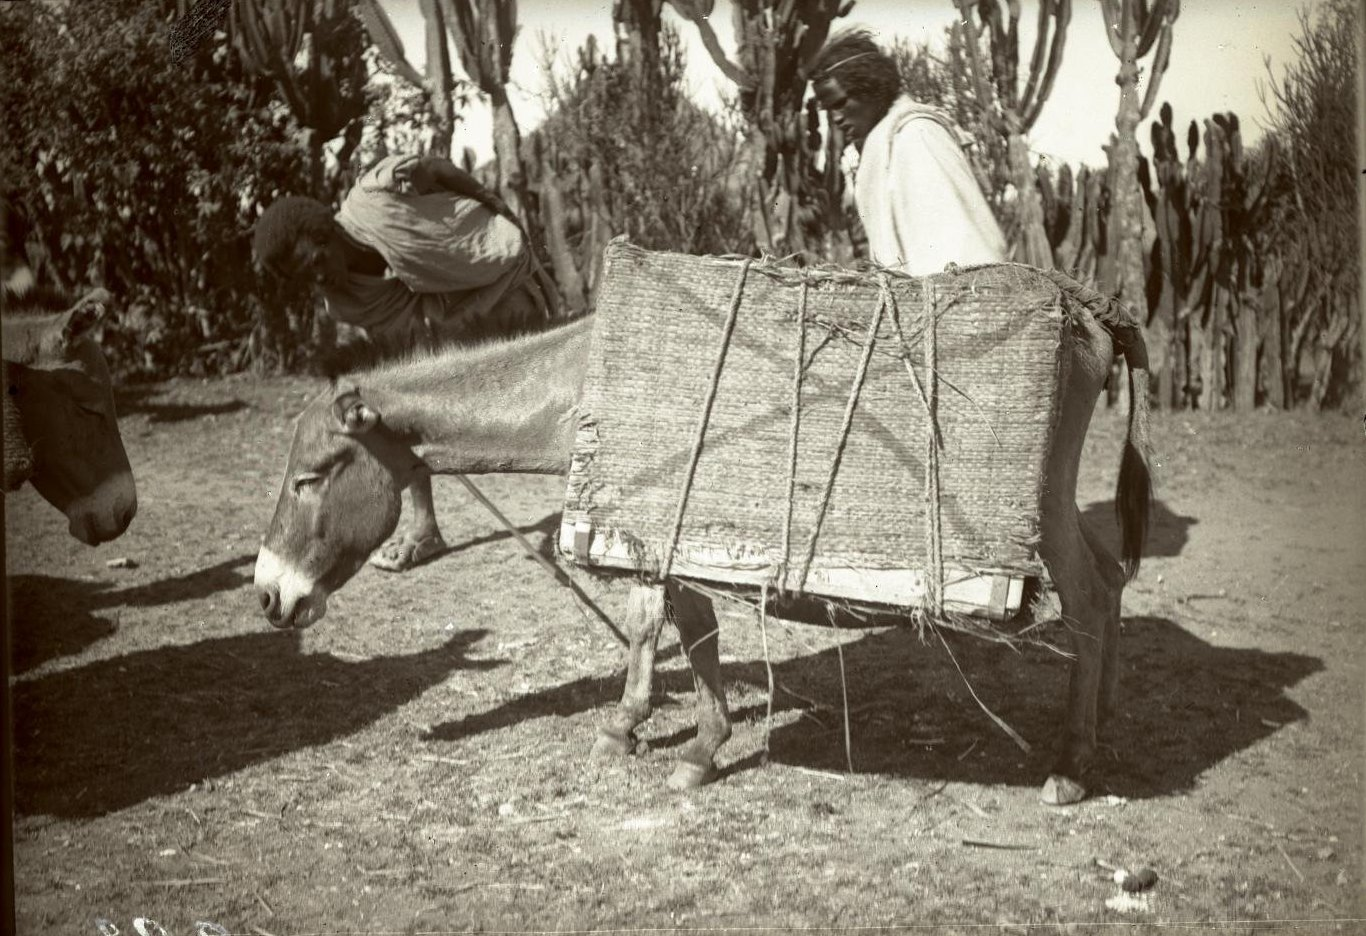 283. Абиссиния, провинция Харар, г. Харар. Нагруженный ослик